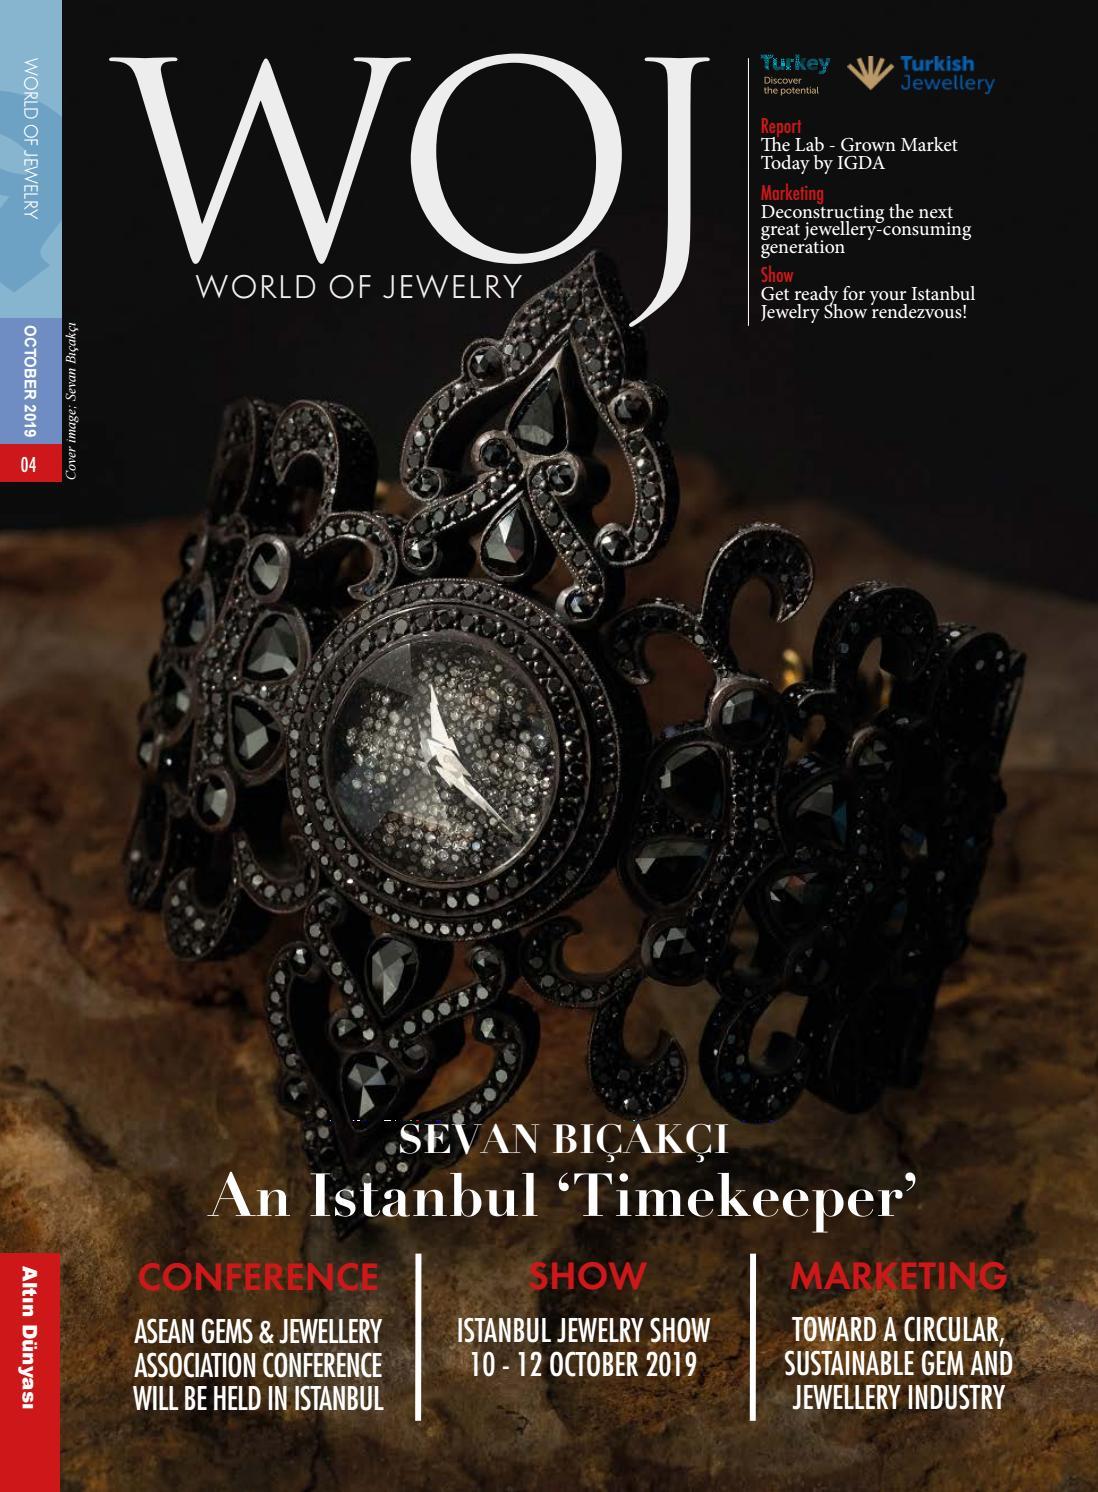 World Of Jewelry October 2019 By Altin Dunyasi Yayin Grubu Issuu